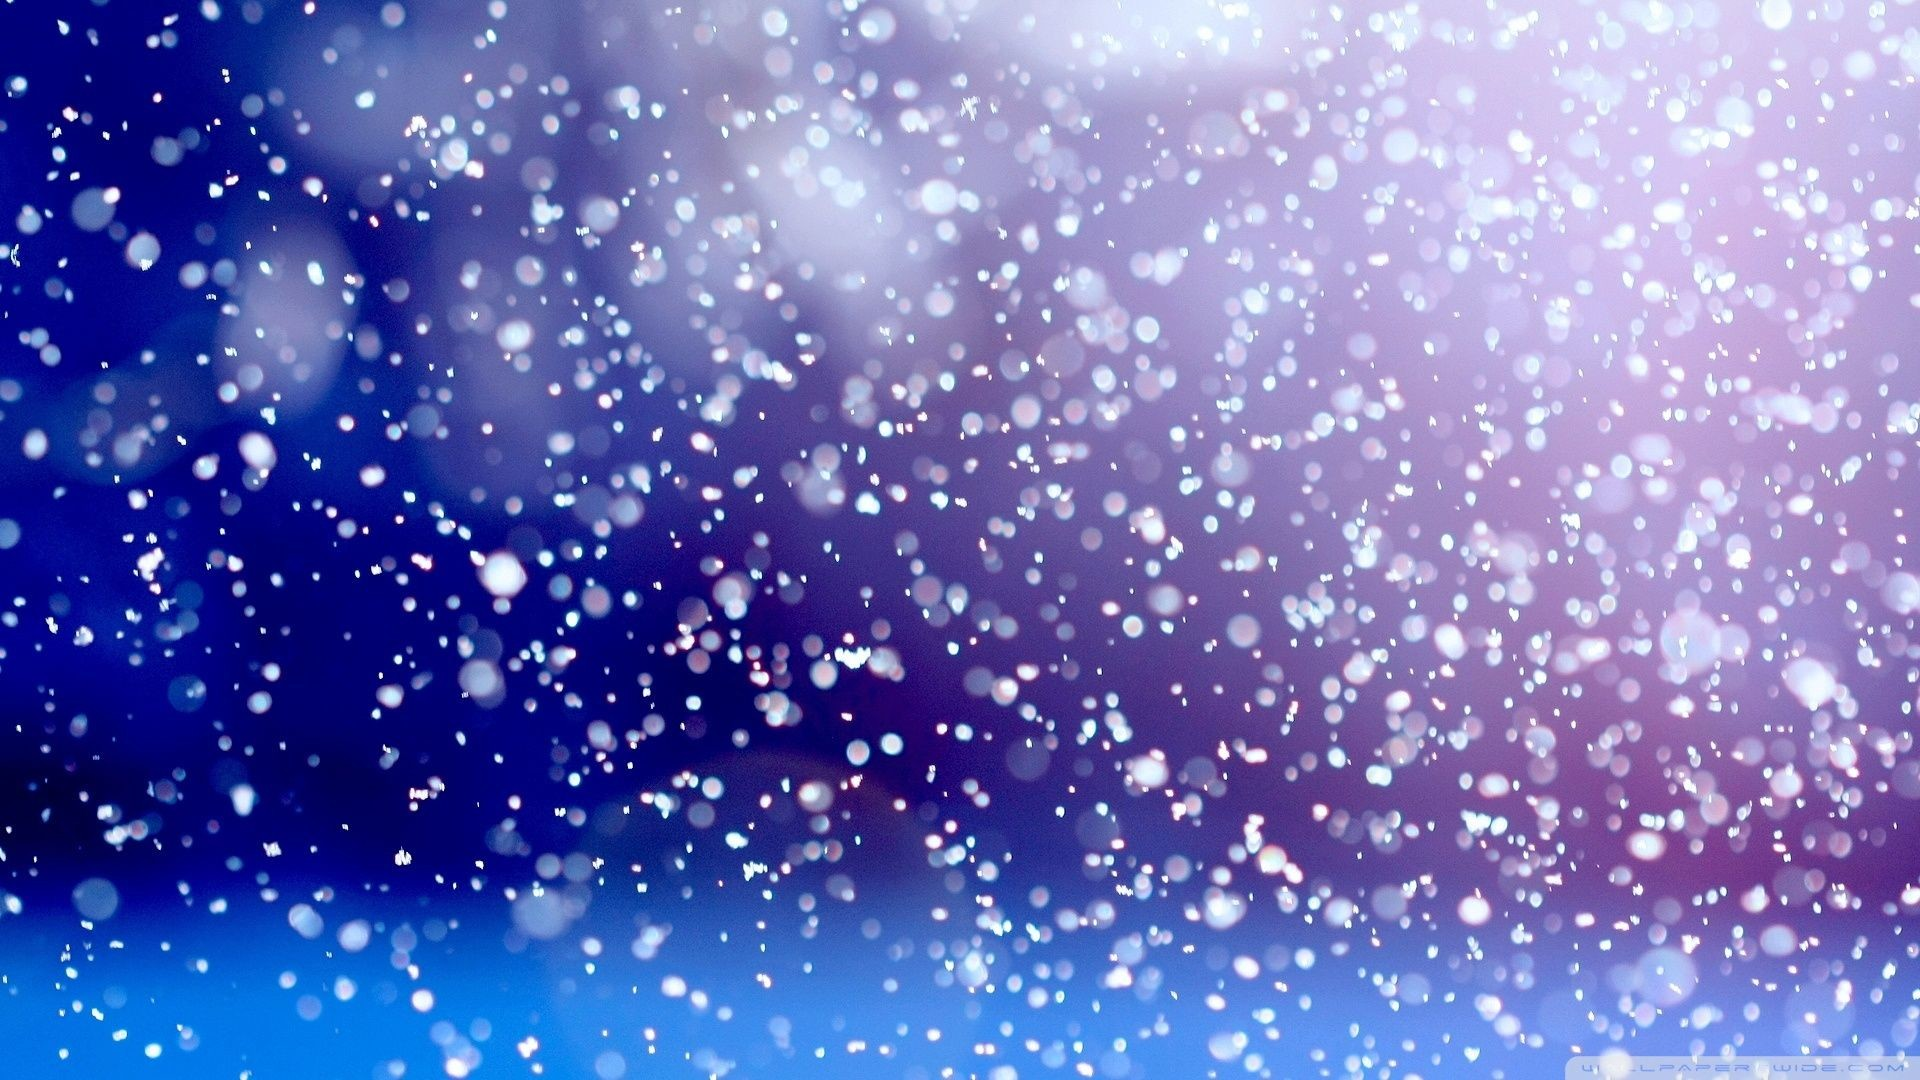 Snow Falling Wallpaper Animated